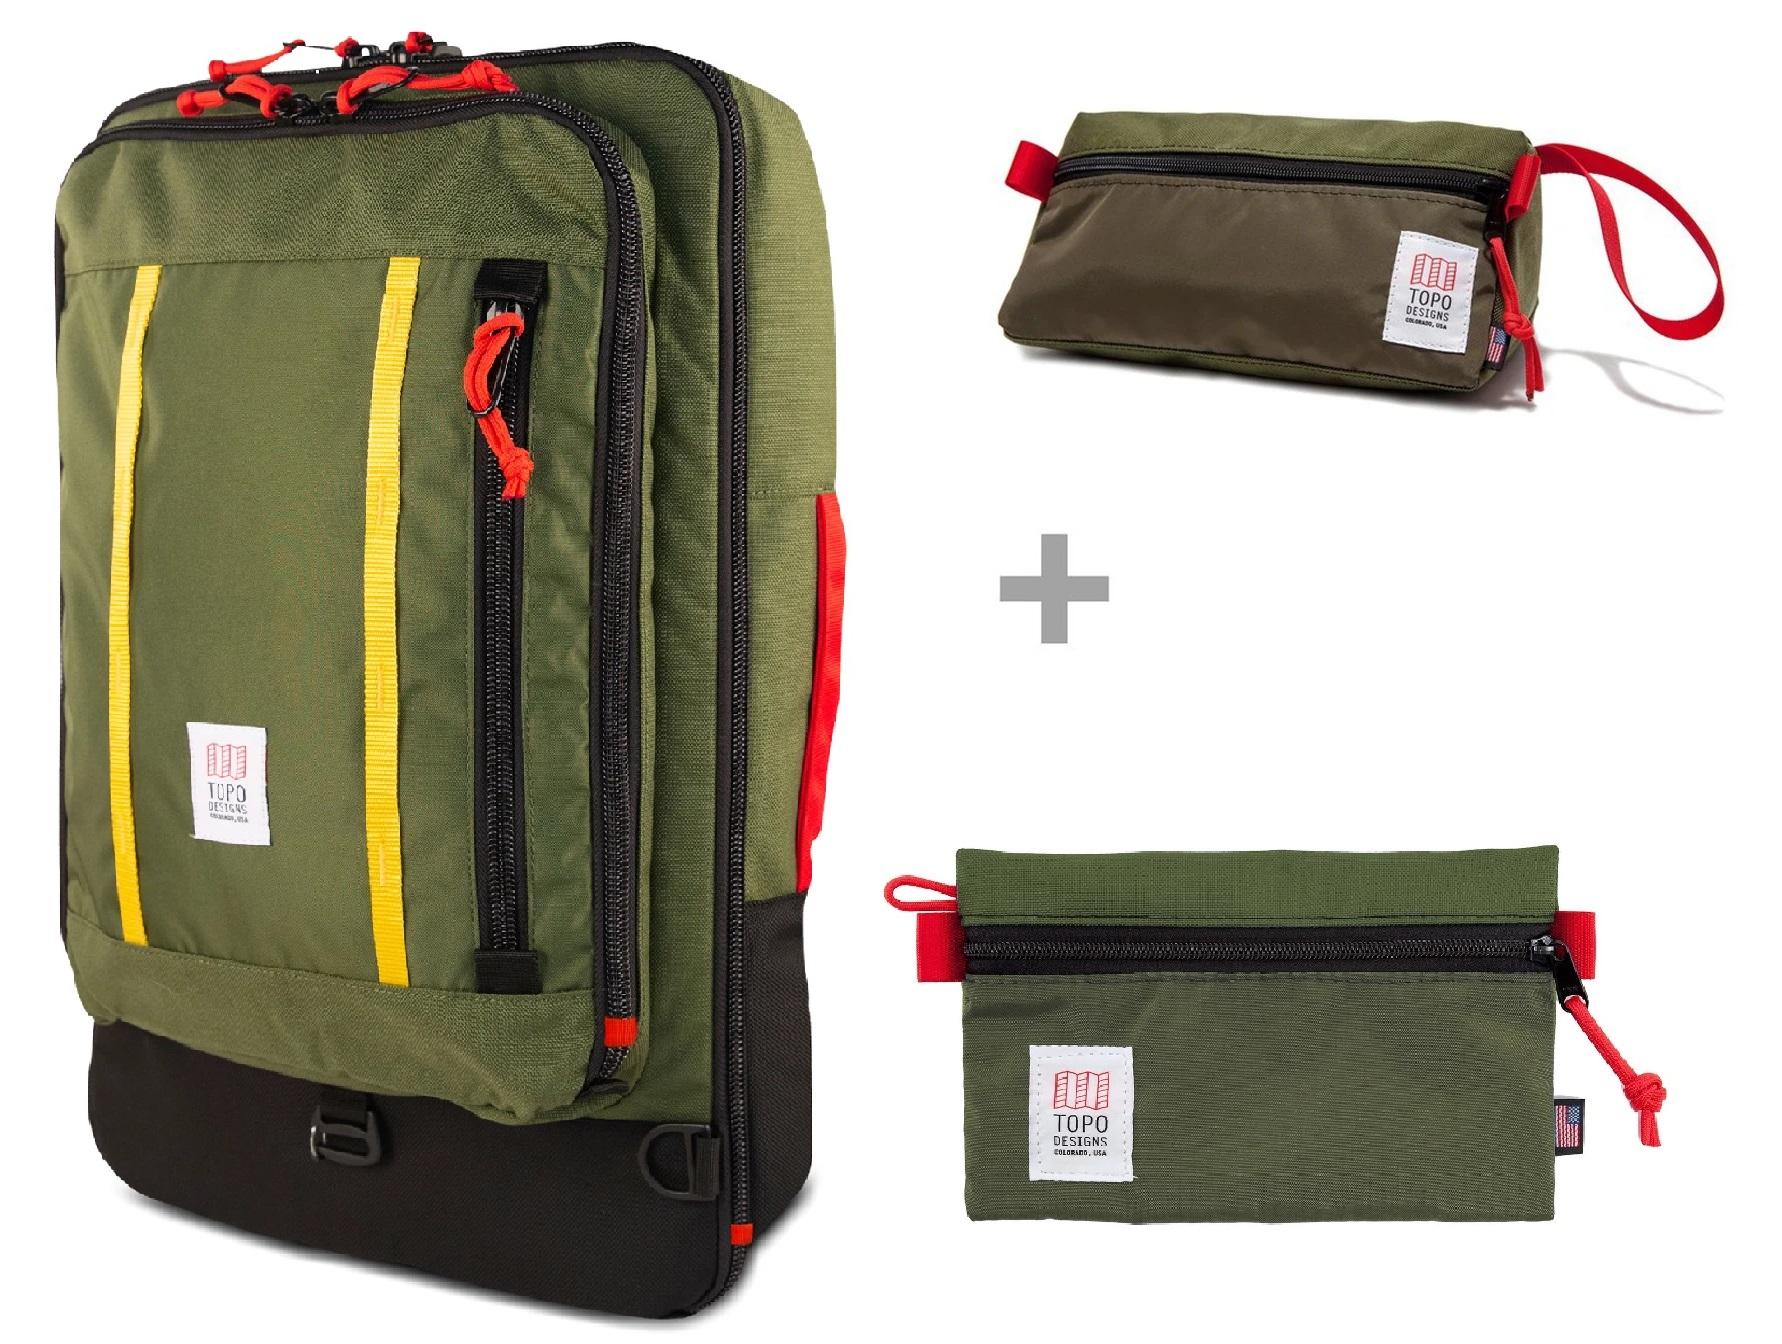 TOPO DESIGNS Escape Travel Bag Kit - 40L